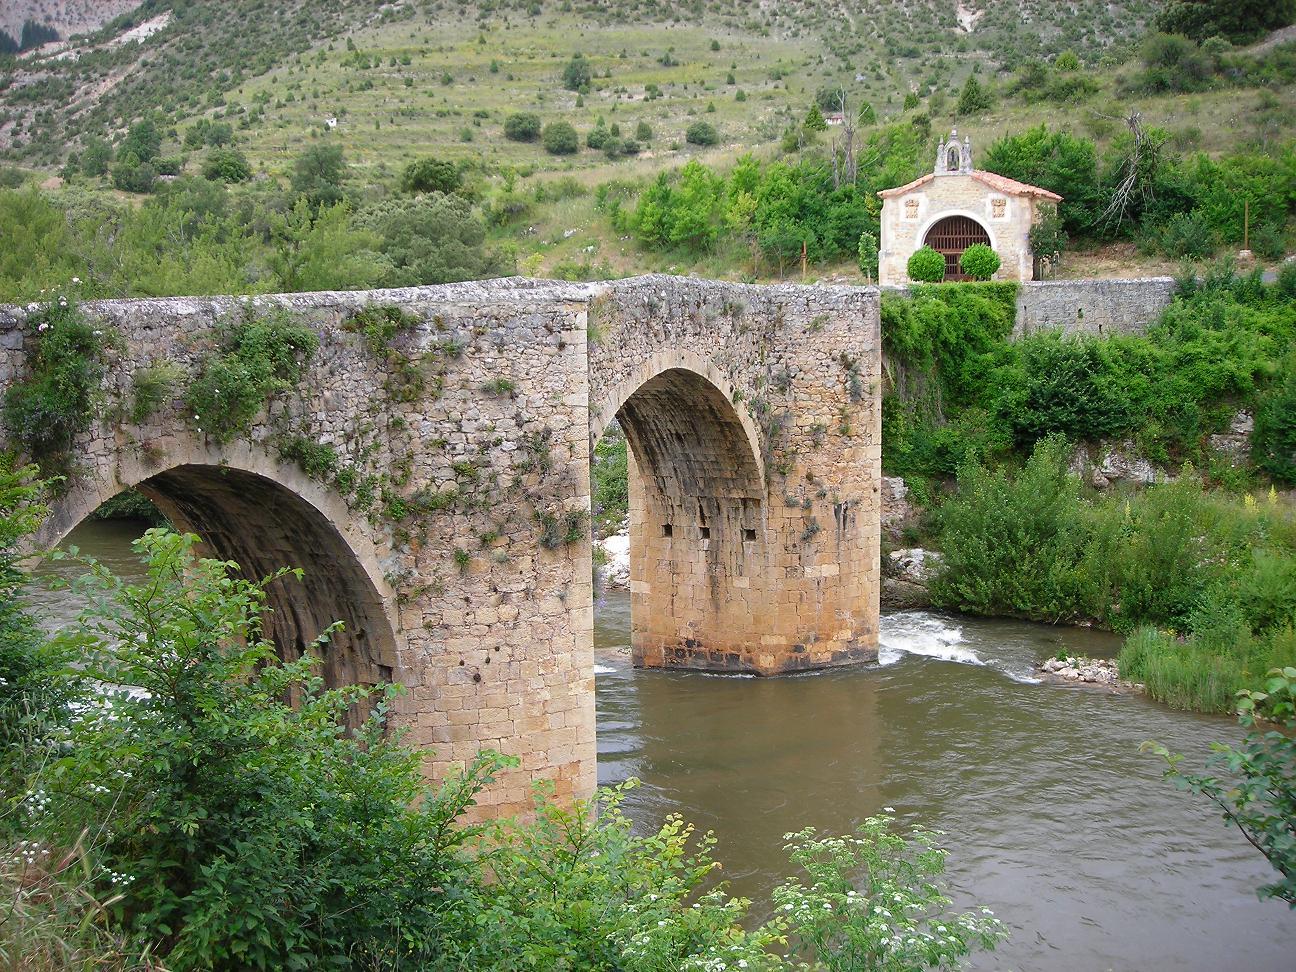 Puente romano Pesquera de Ebro - Ruta Orbaneja del Castillo